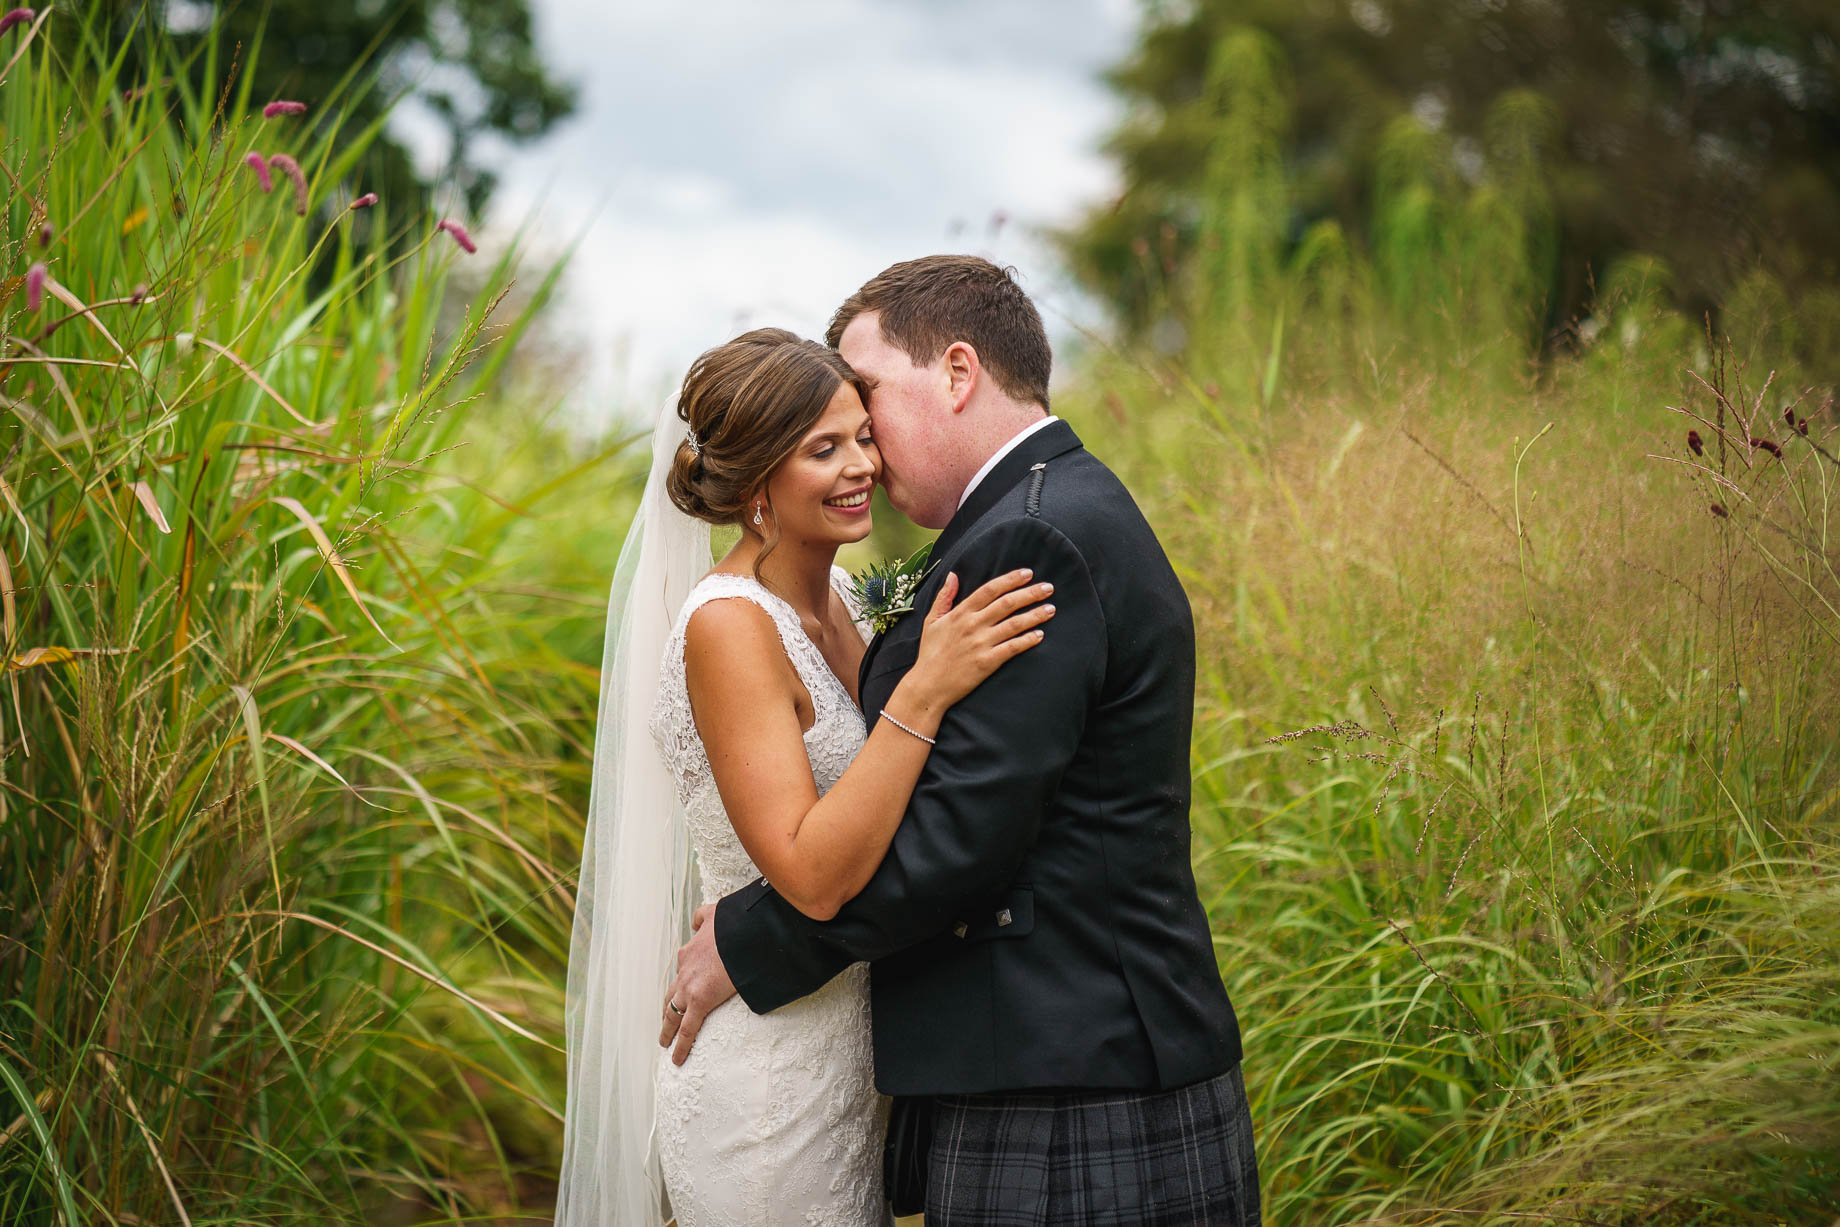 Bury Court Barn wedding photography - Esther and Gregor